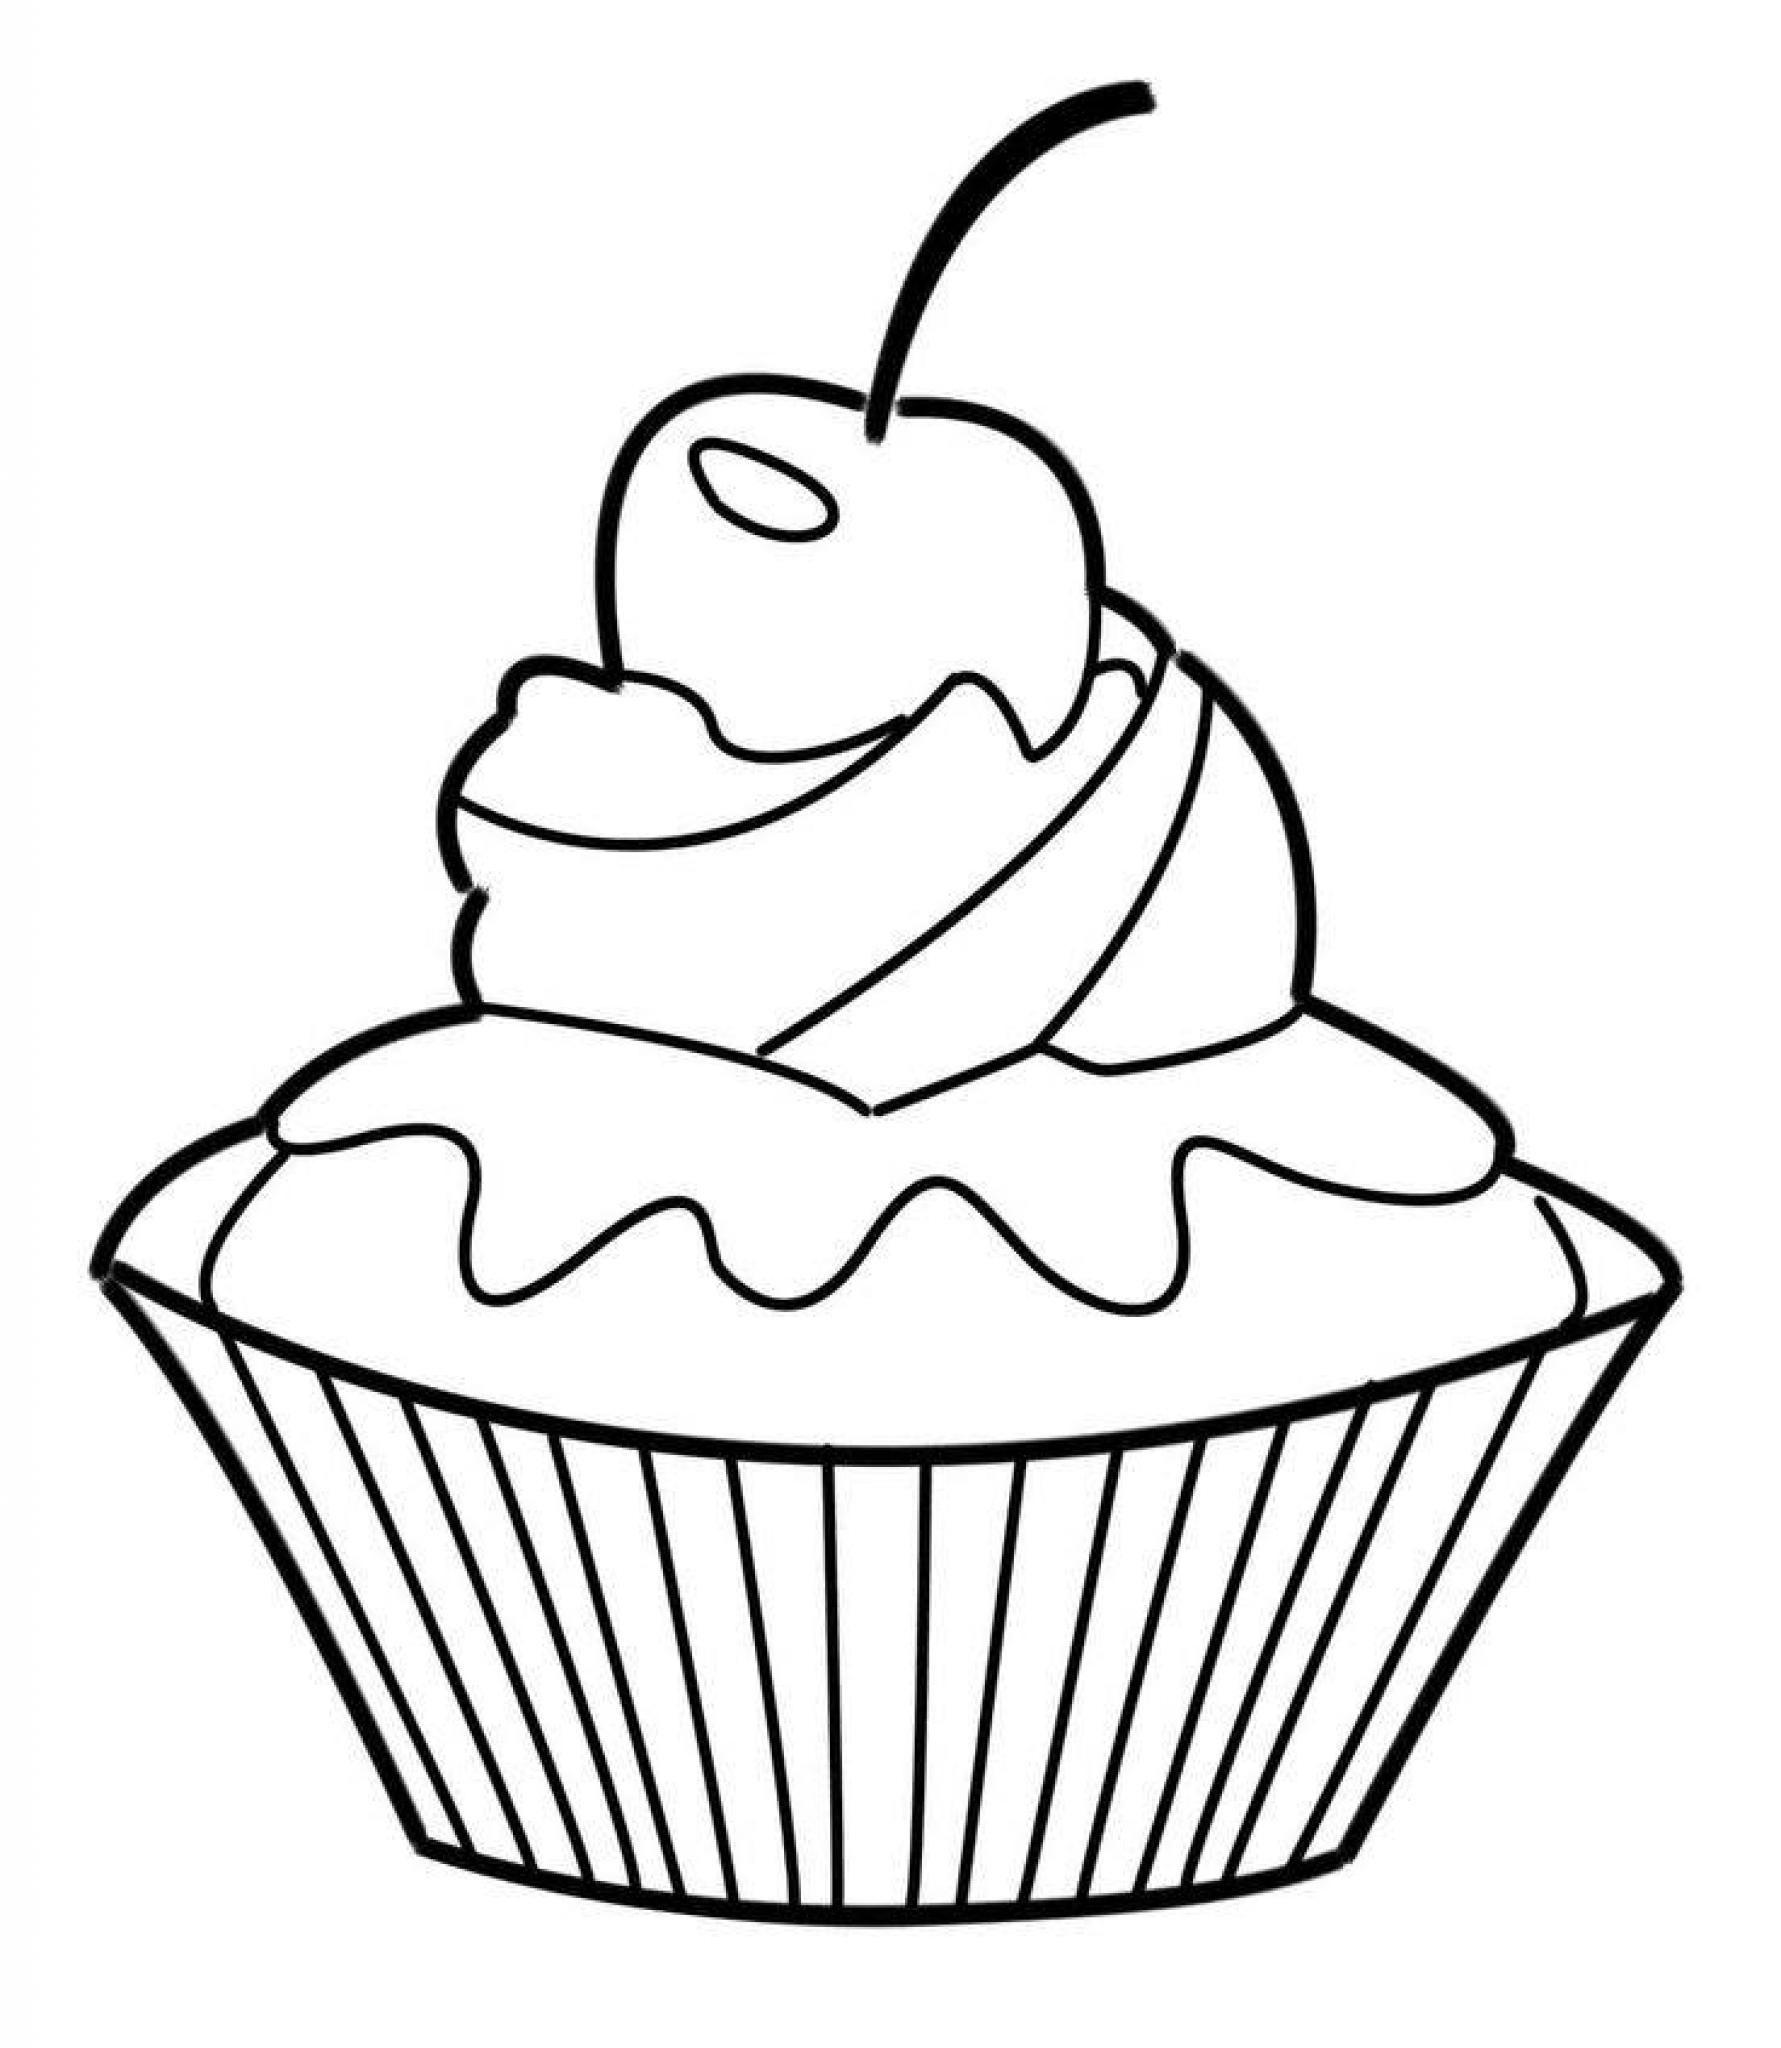 dortíky šablony - Hledat Googlem | Šablony | Pinterest | Macarons